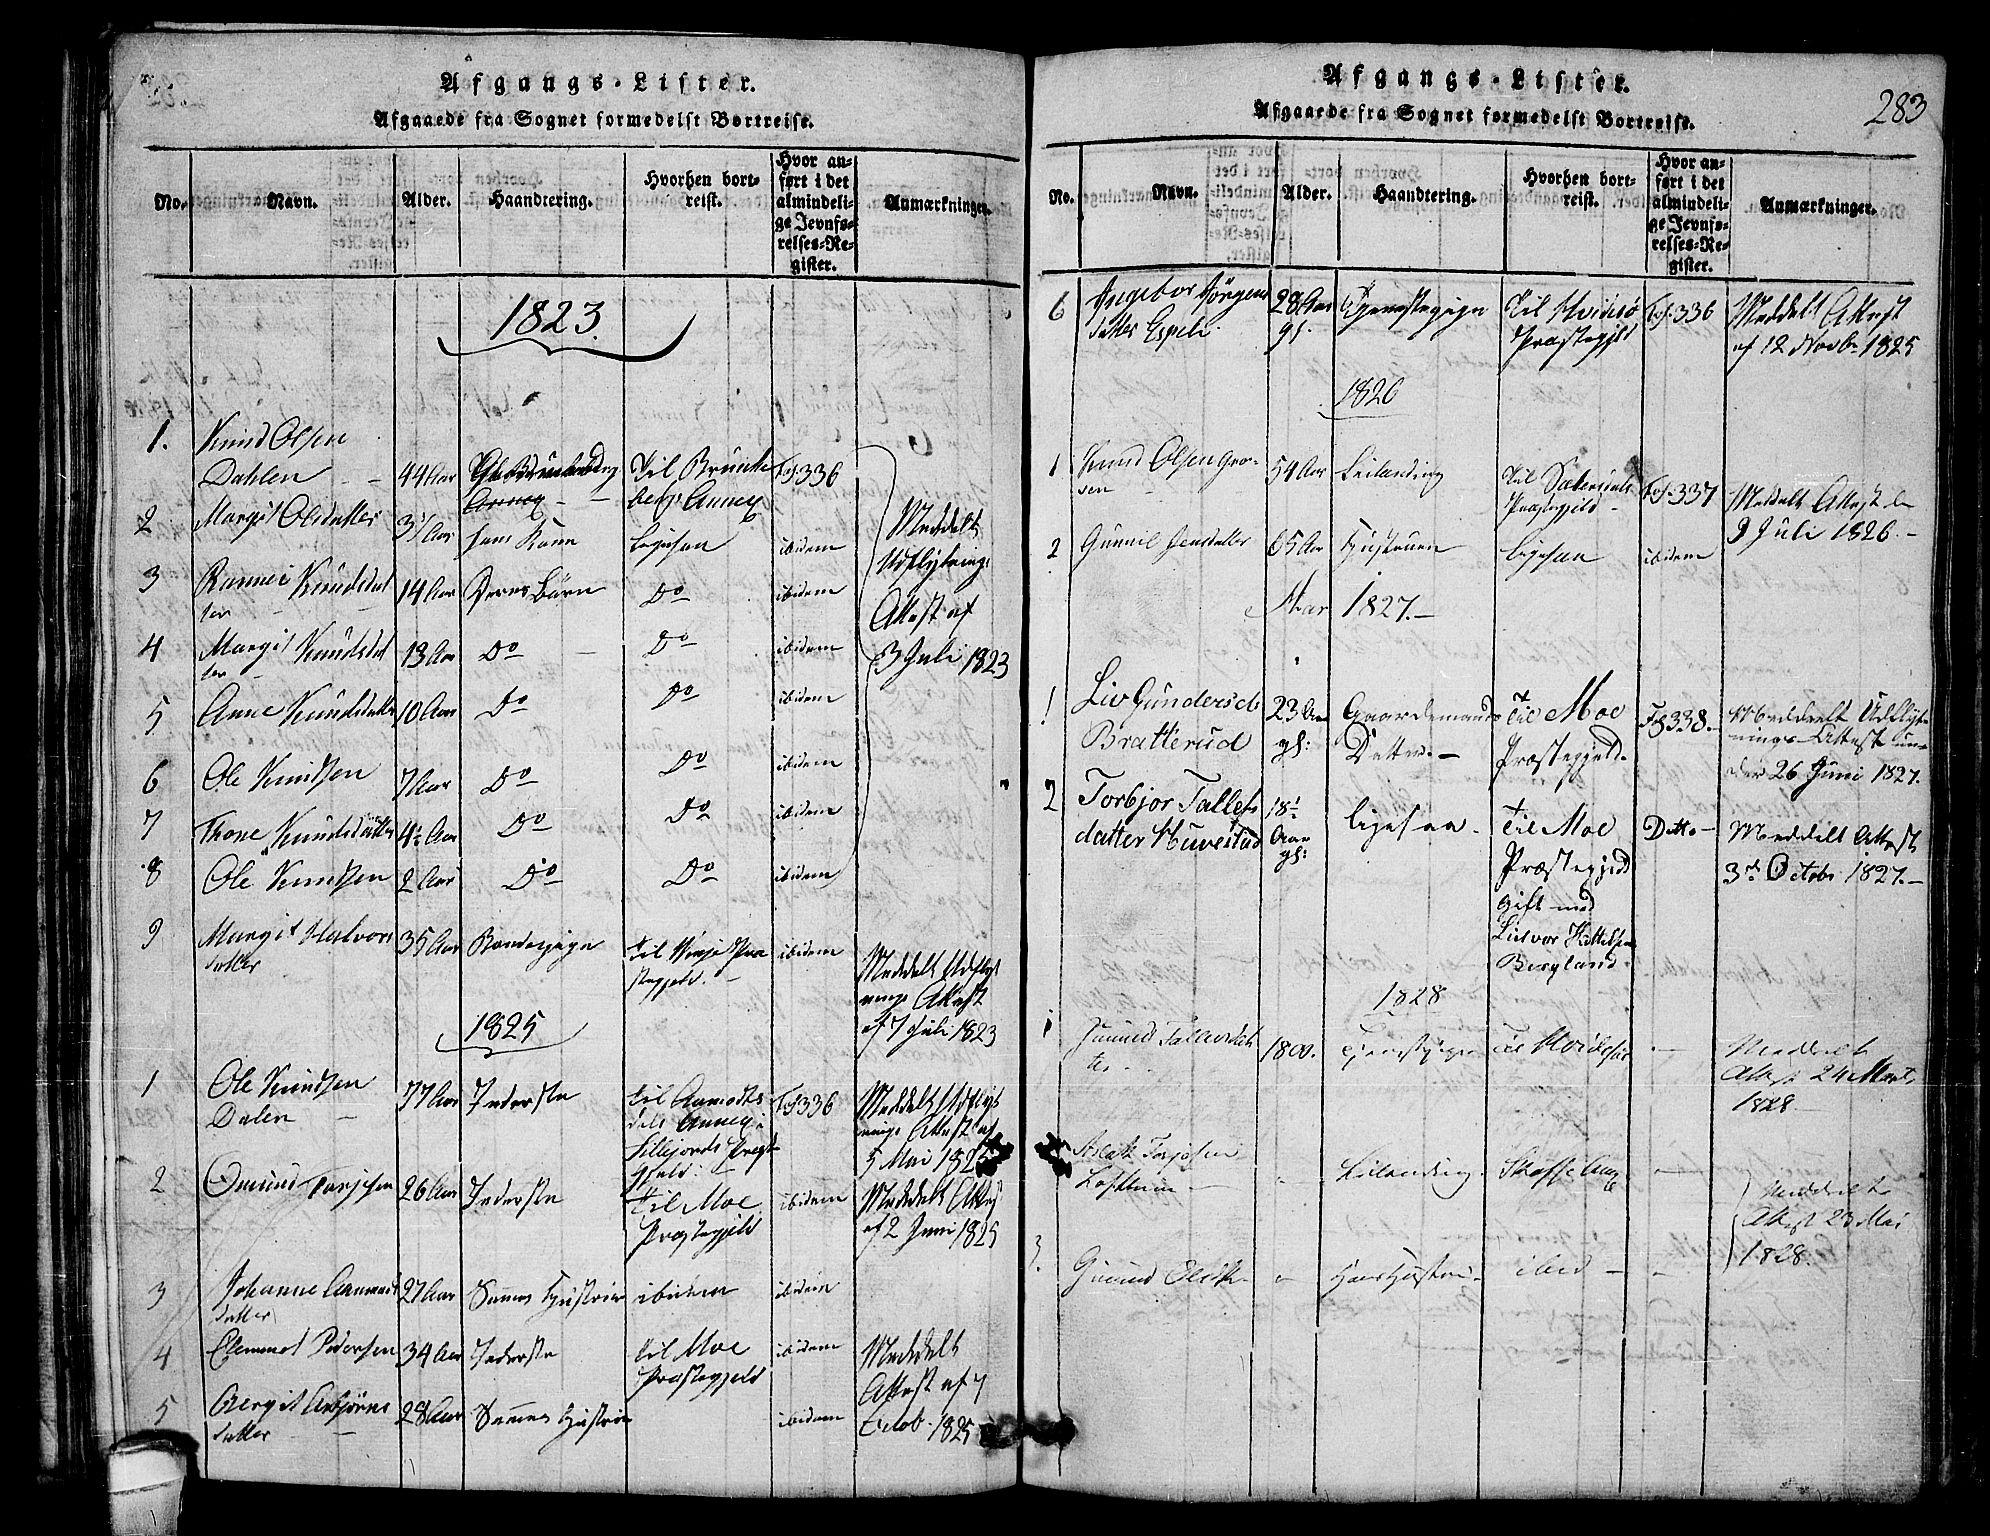 SAKO, Lårdal kirkebøker, G/Gb/L0001: Klokkerbok nr. II 1, 1815-1865, s. 283